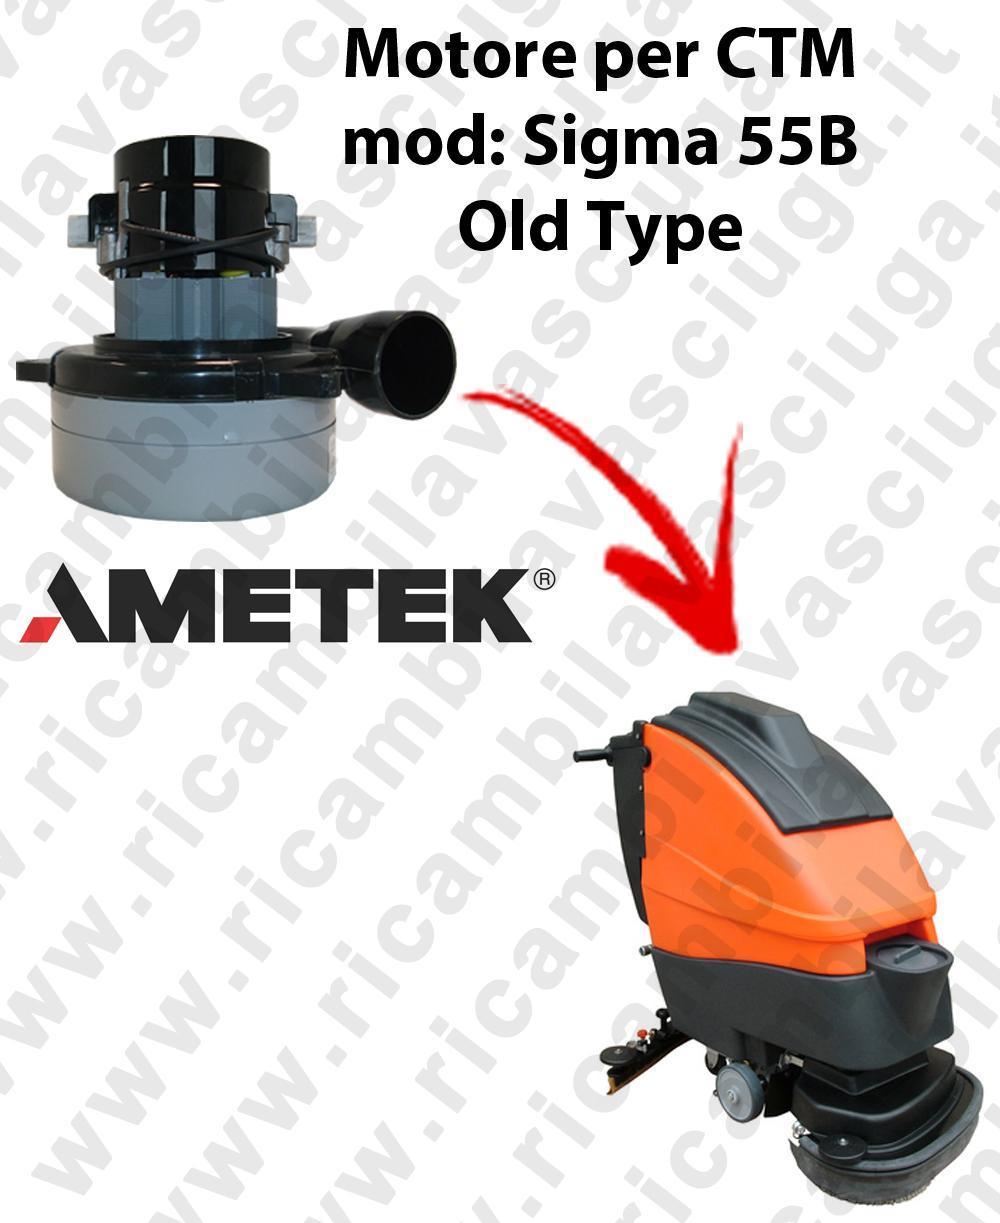 SIGMA 55 B old type Motore de aspiración LAMB AMETEK para fregadora CTM